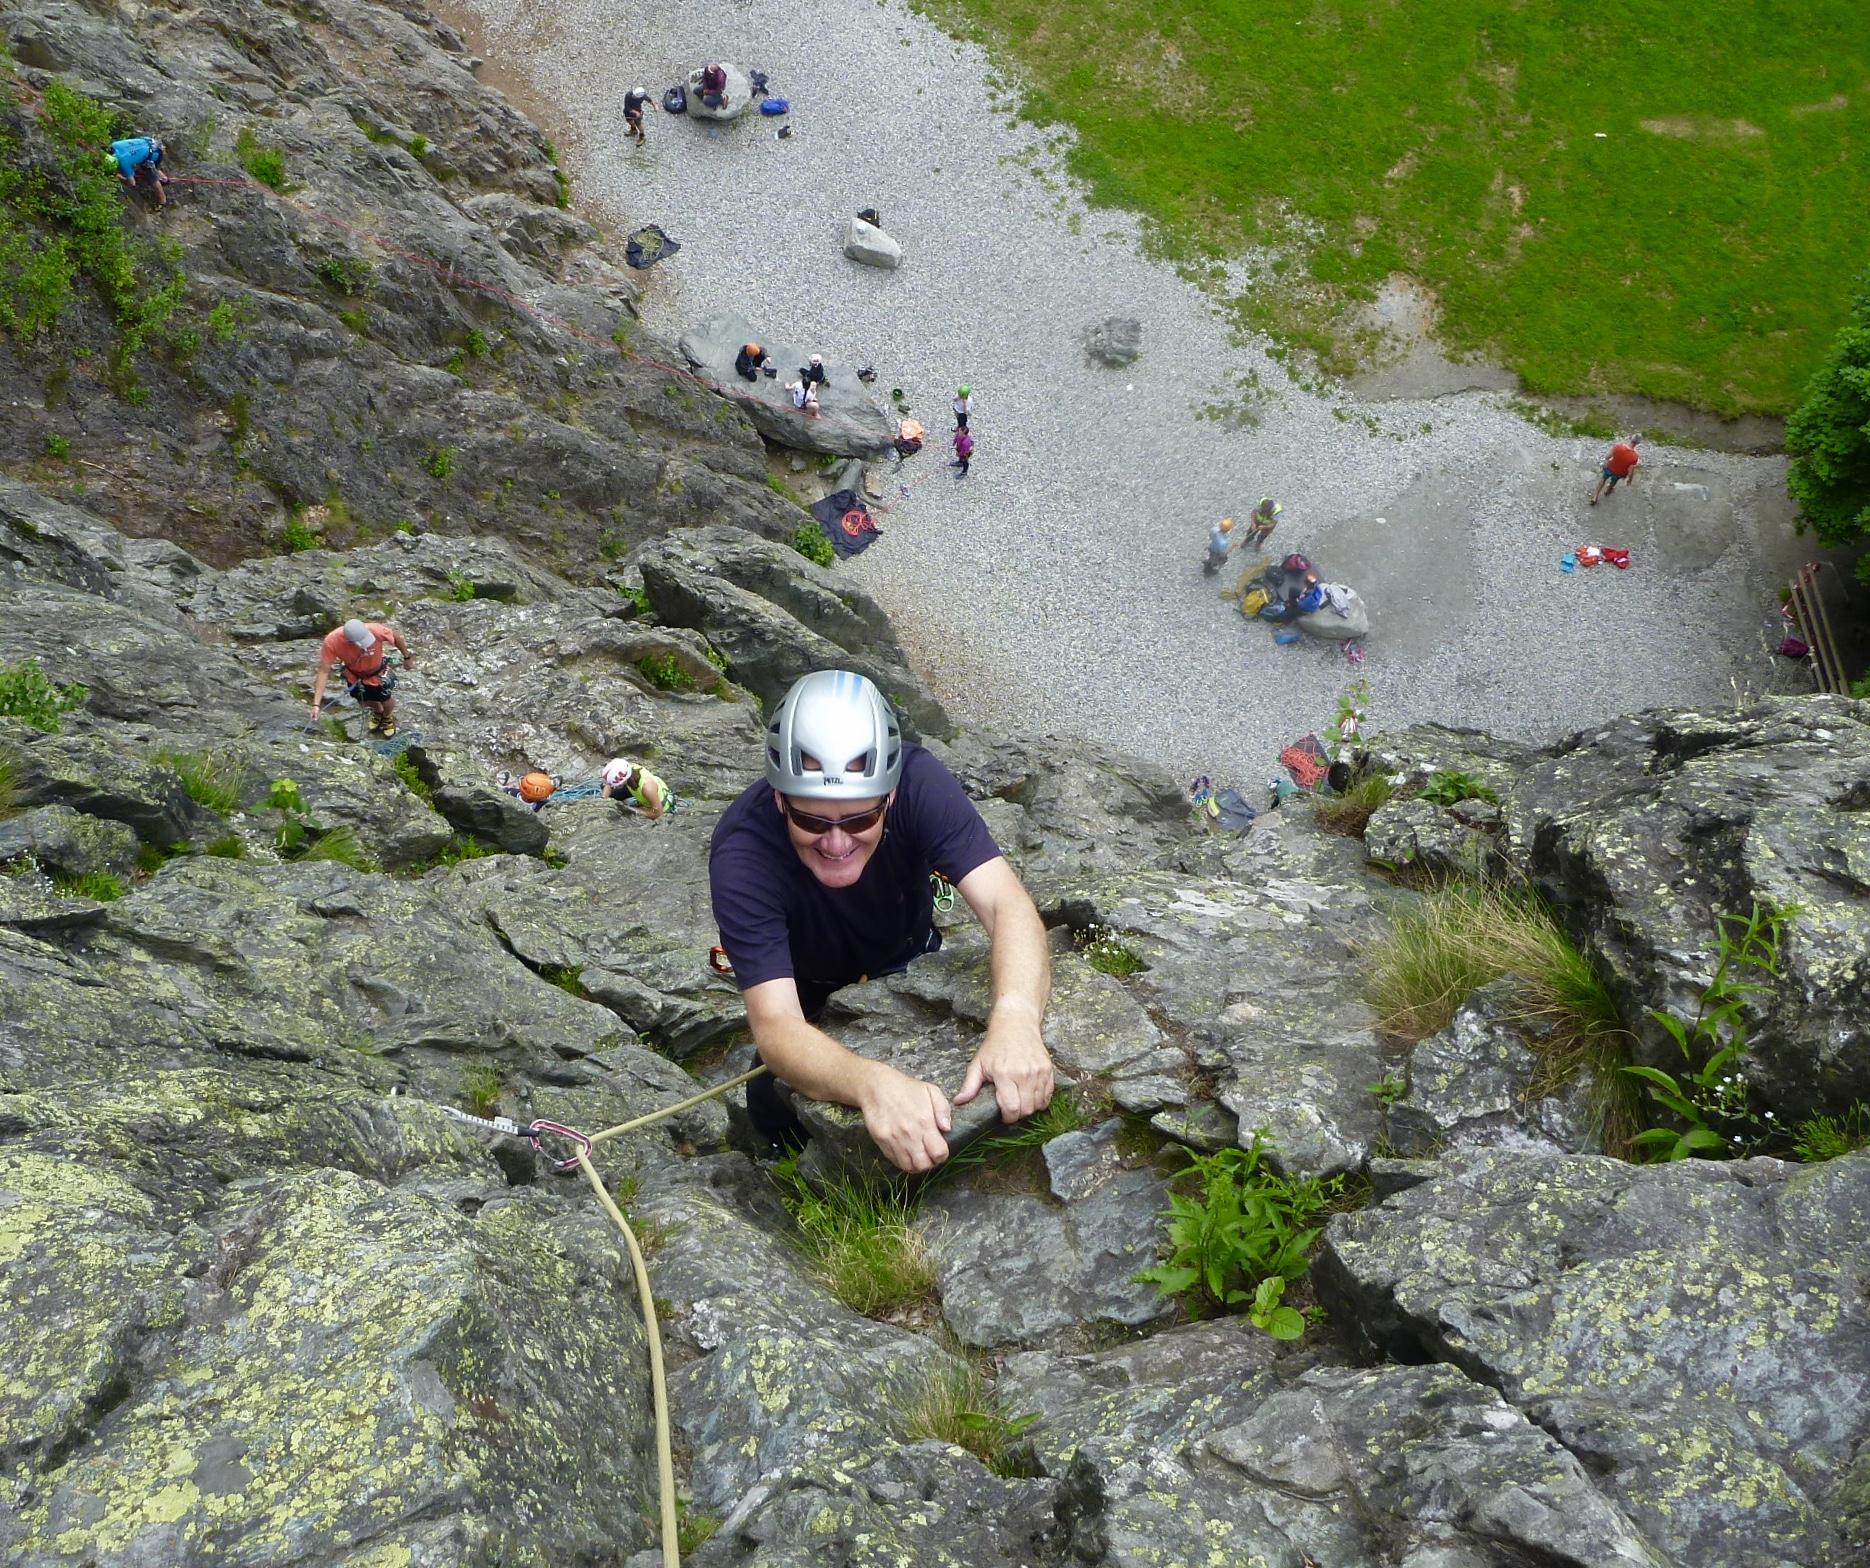 Chamonix Rock Climbing | High Mountain Guides